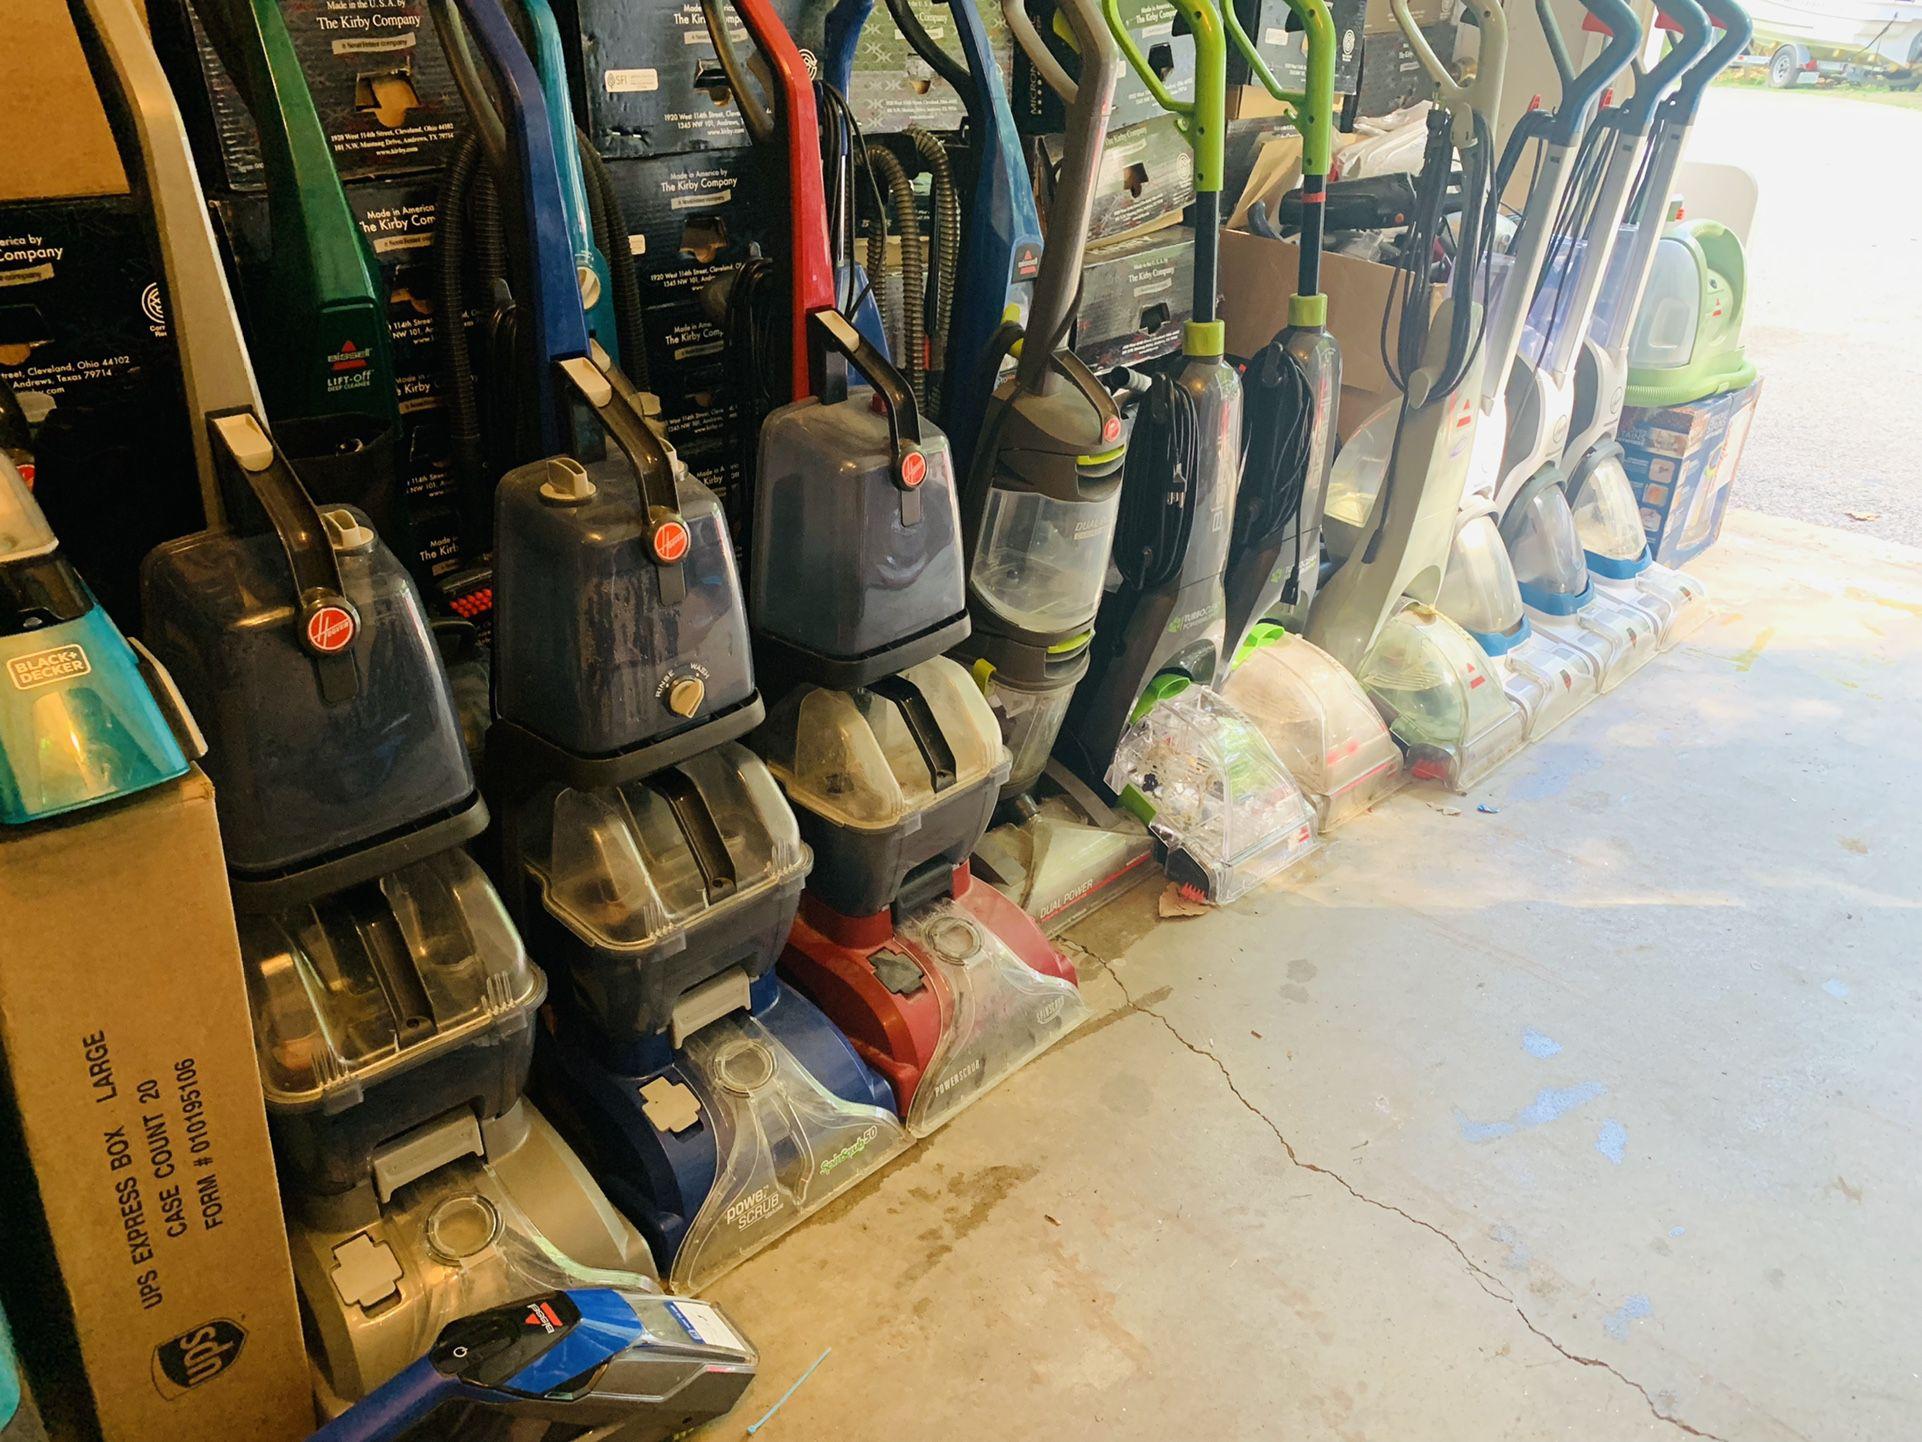 Working carpet shampooers